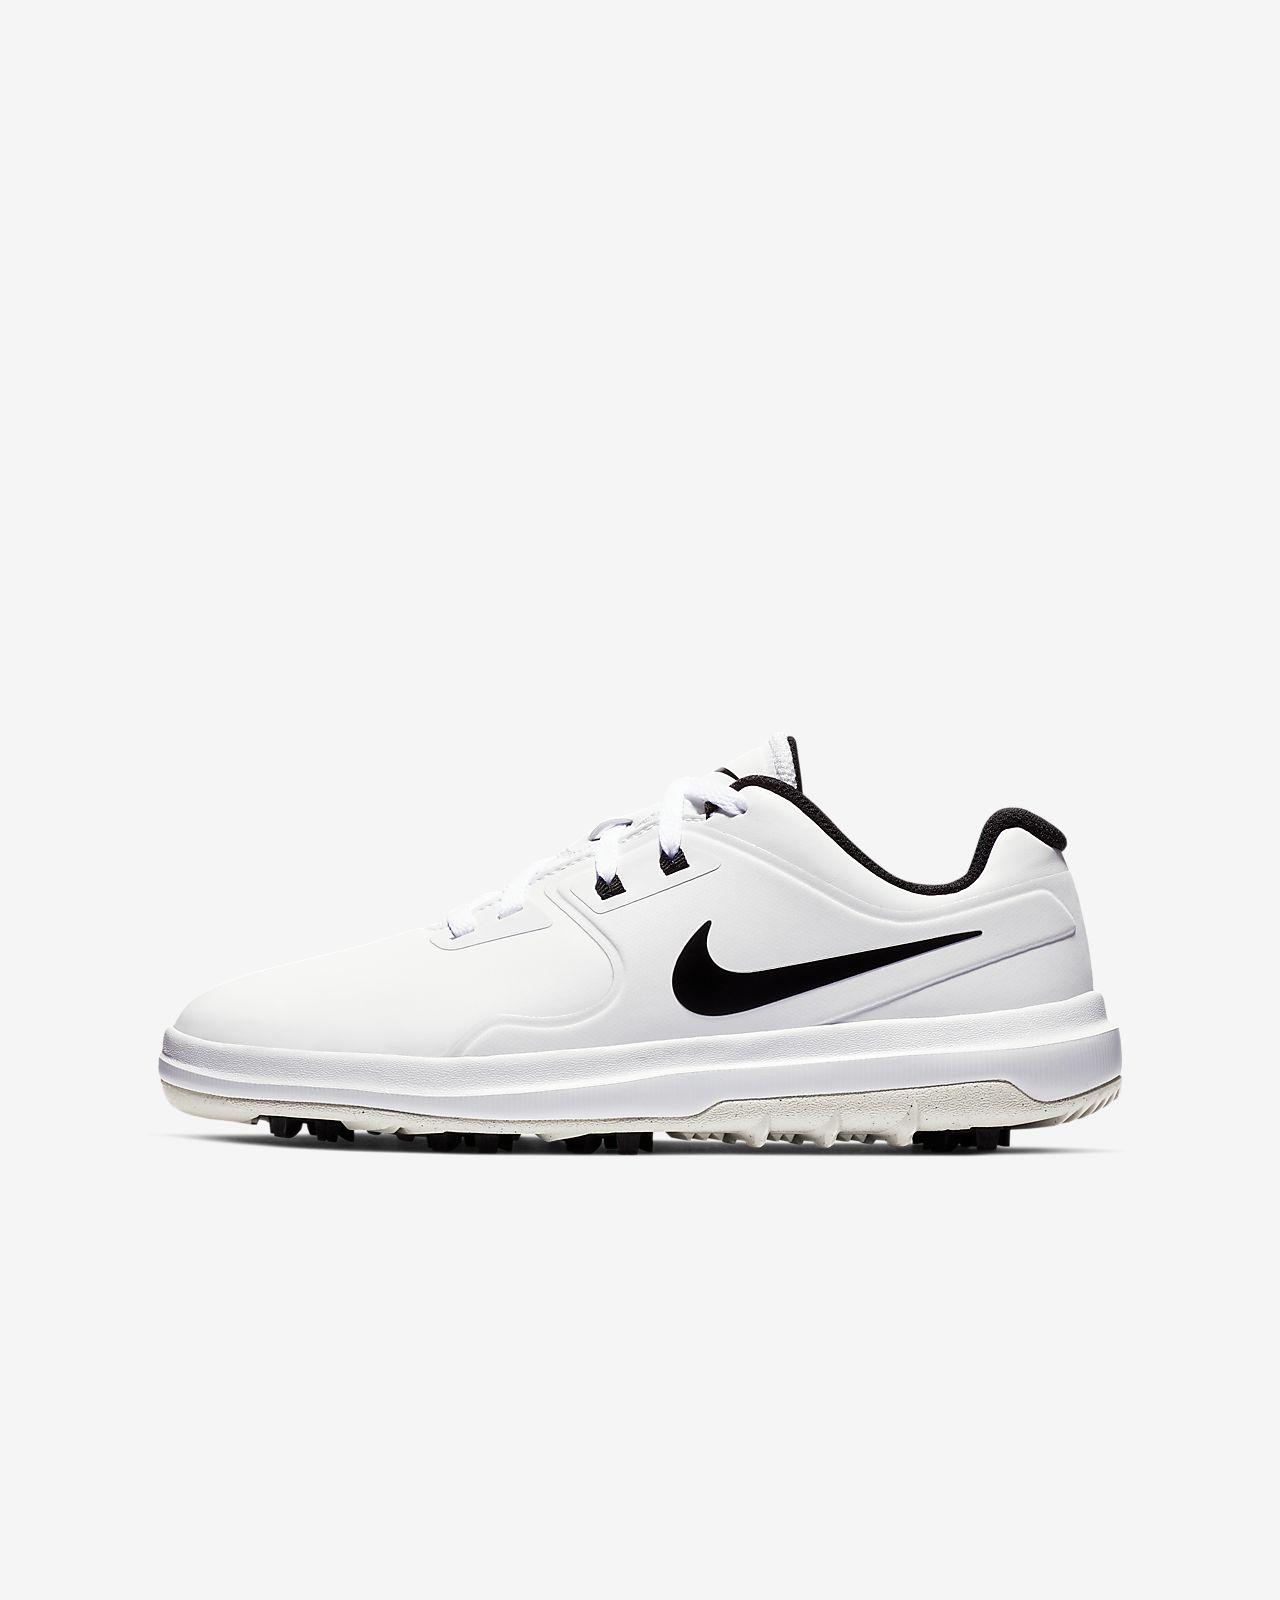 Nike Vapor Pro Jr. Zapatillas de golf - Niño/a y niño/a pequeño/a